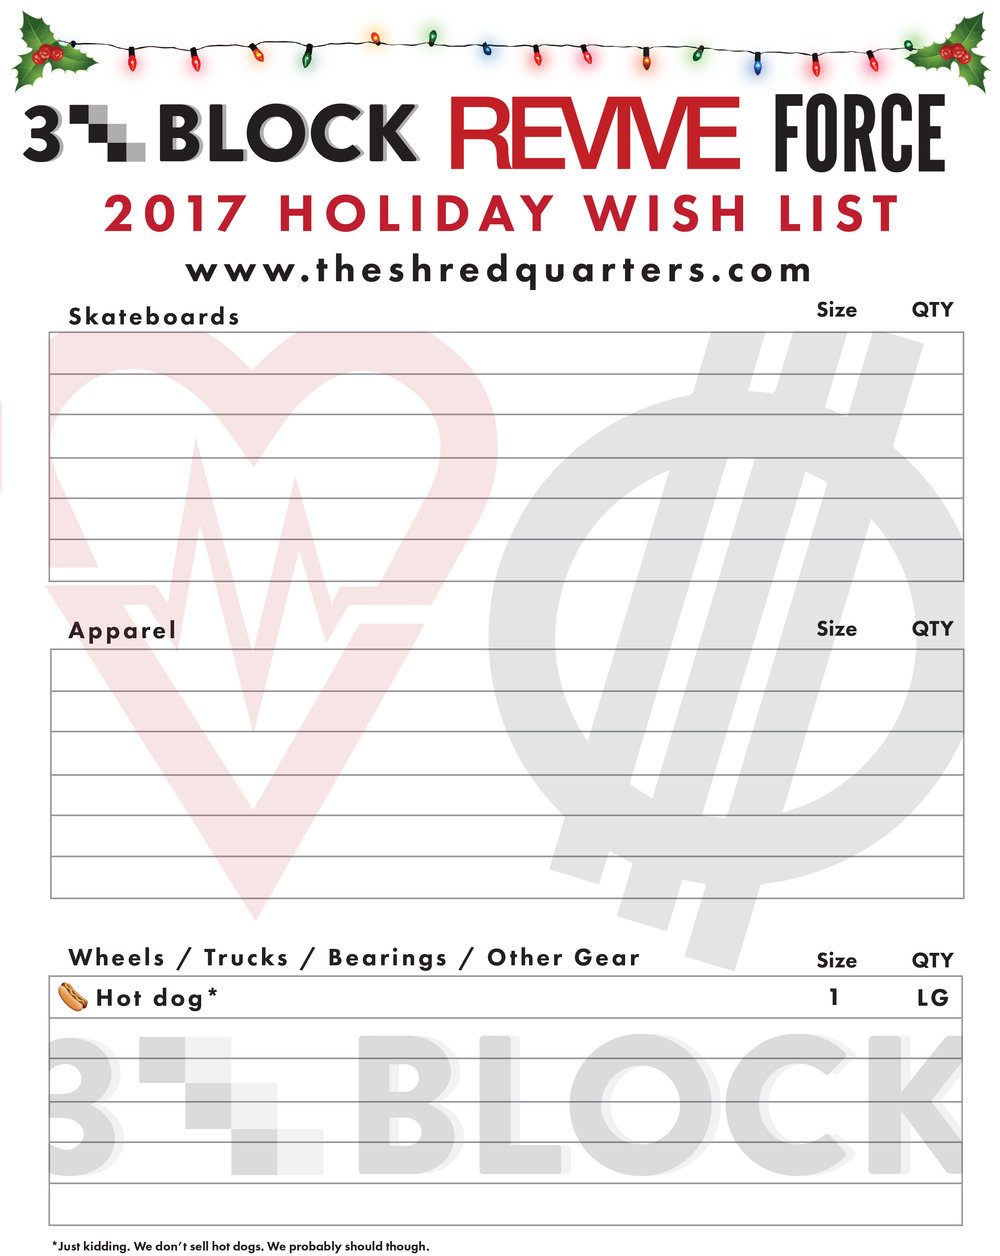 2017 holiday wish list.jpg